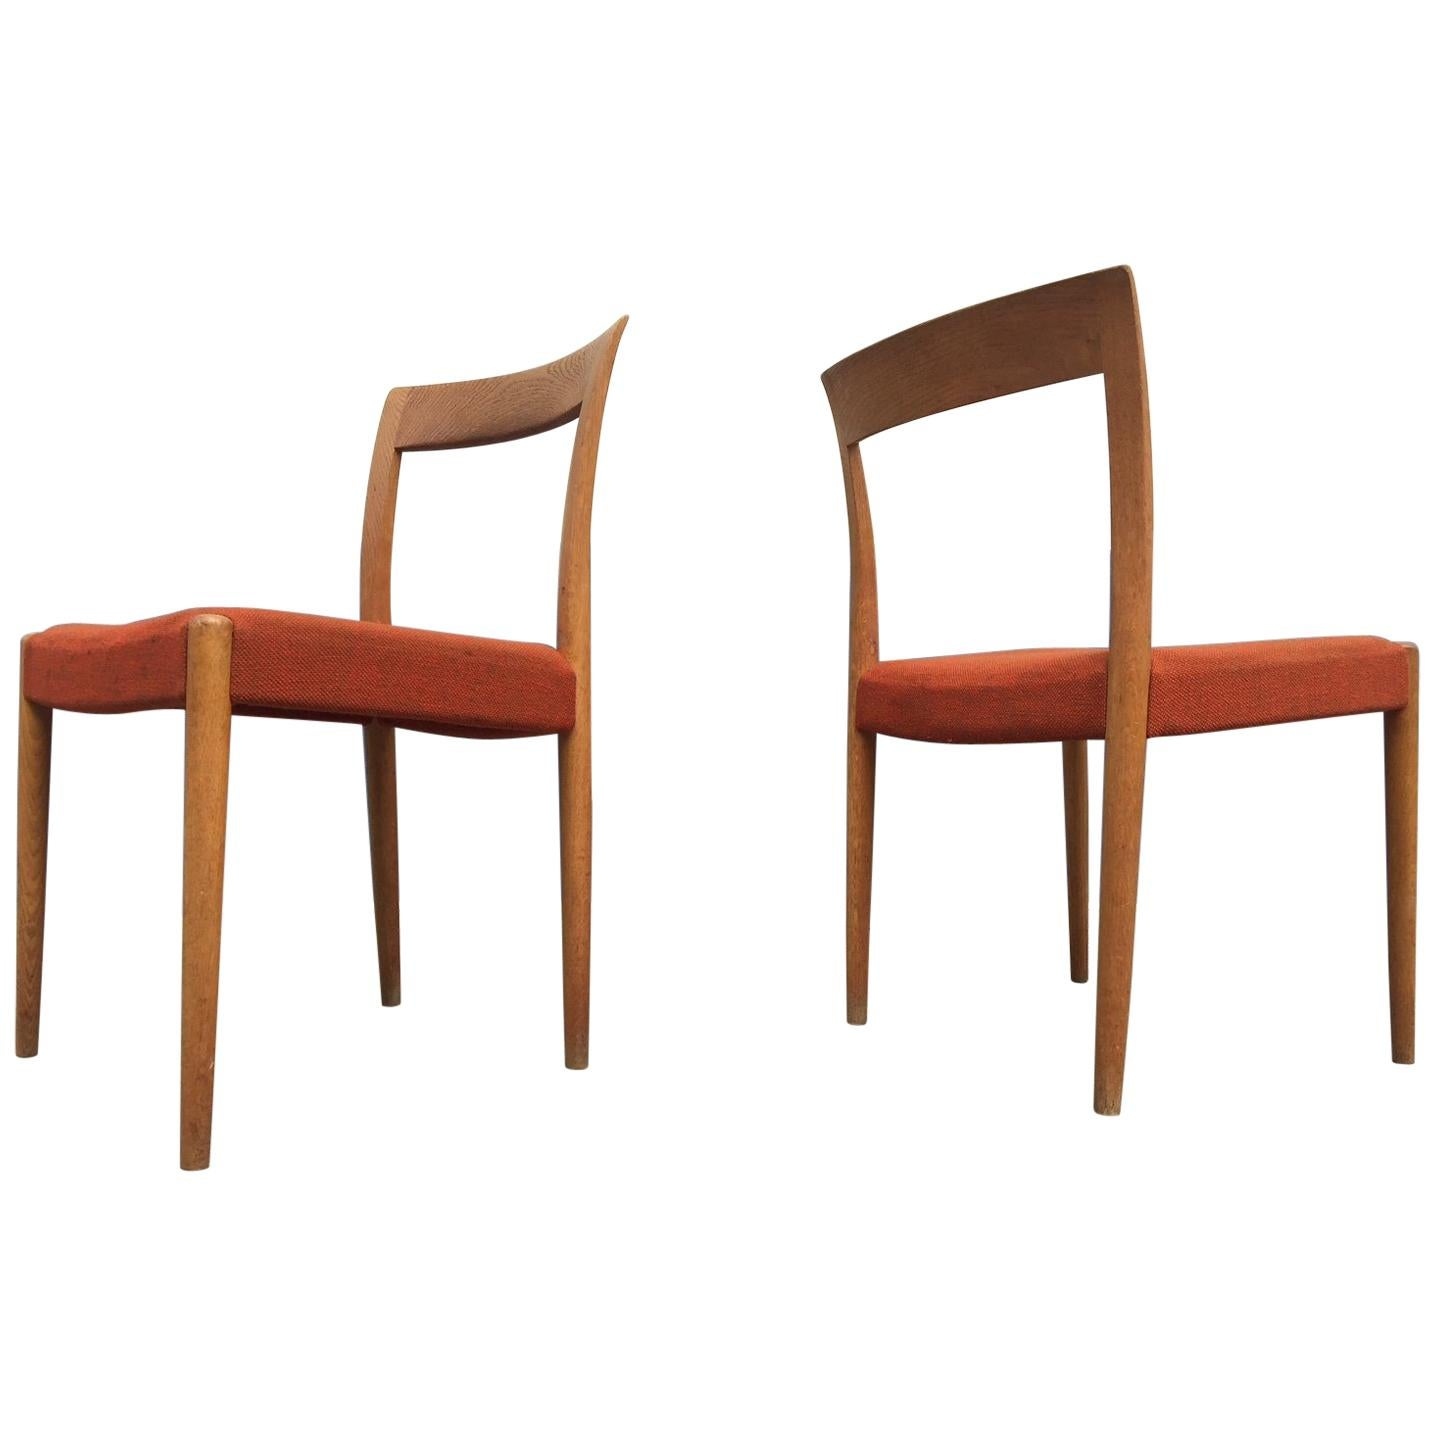 Danish Midcentury Oak Side Chairs by Søren Willadsen, 1960s